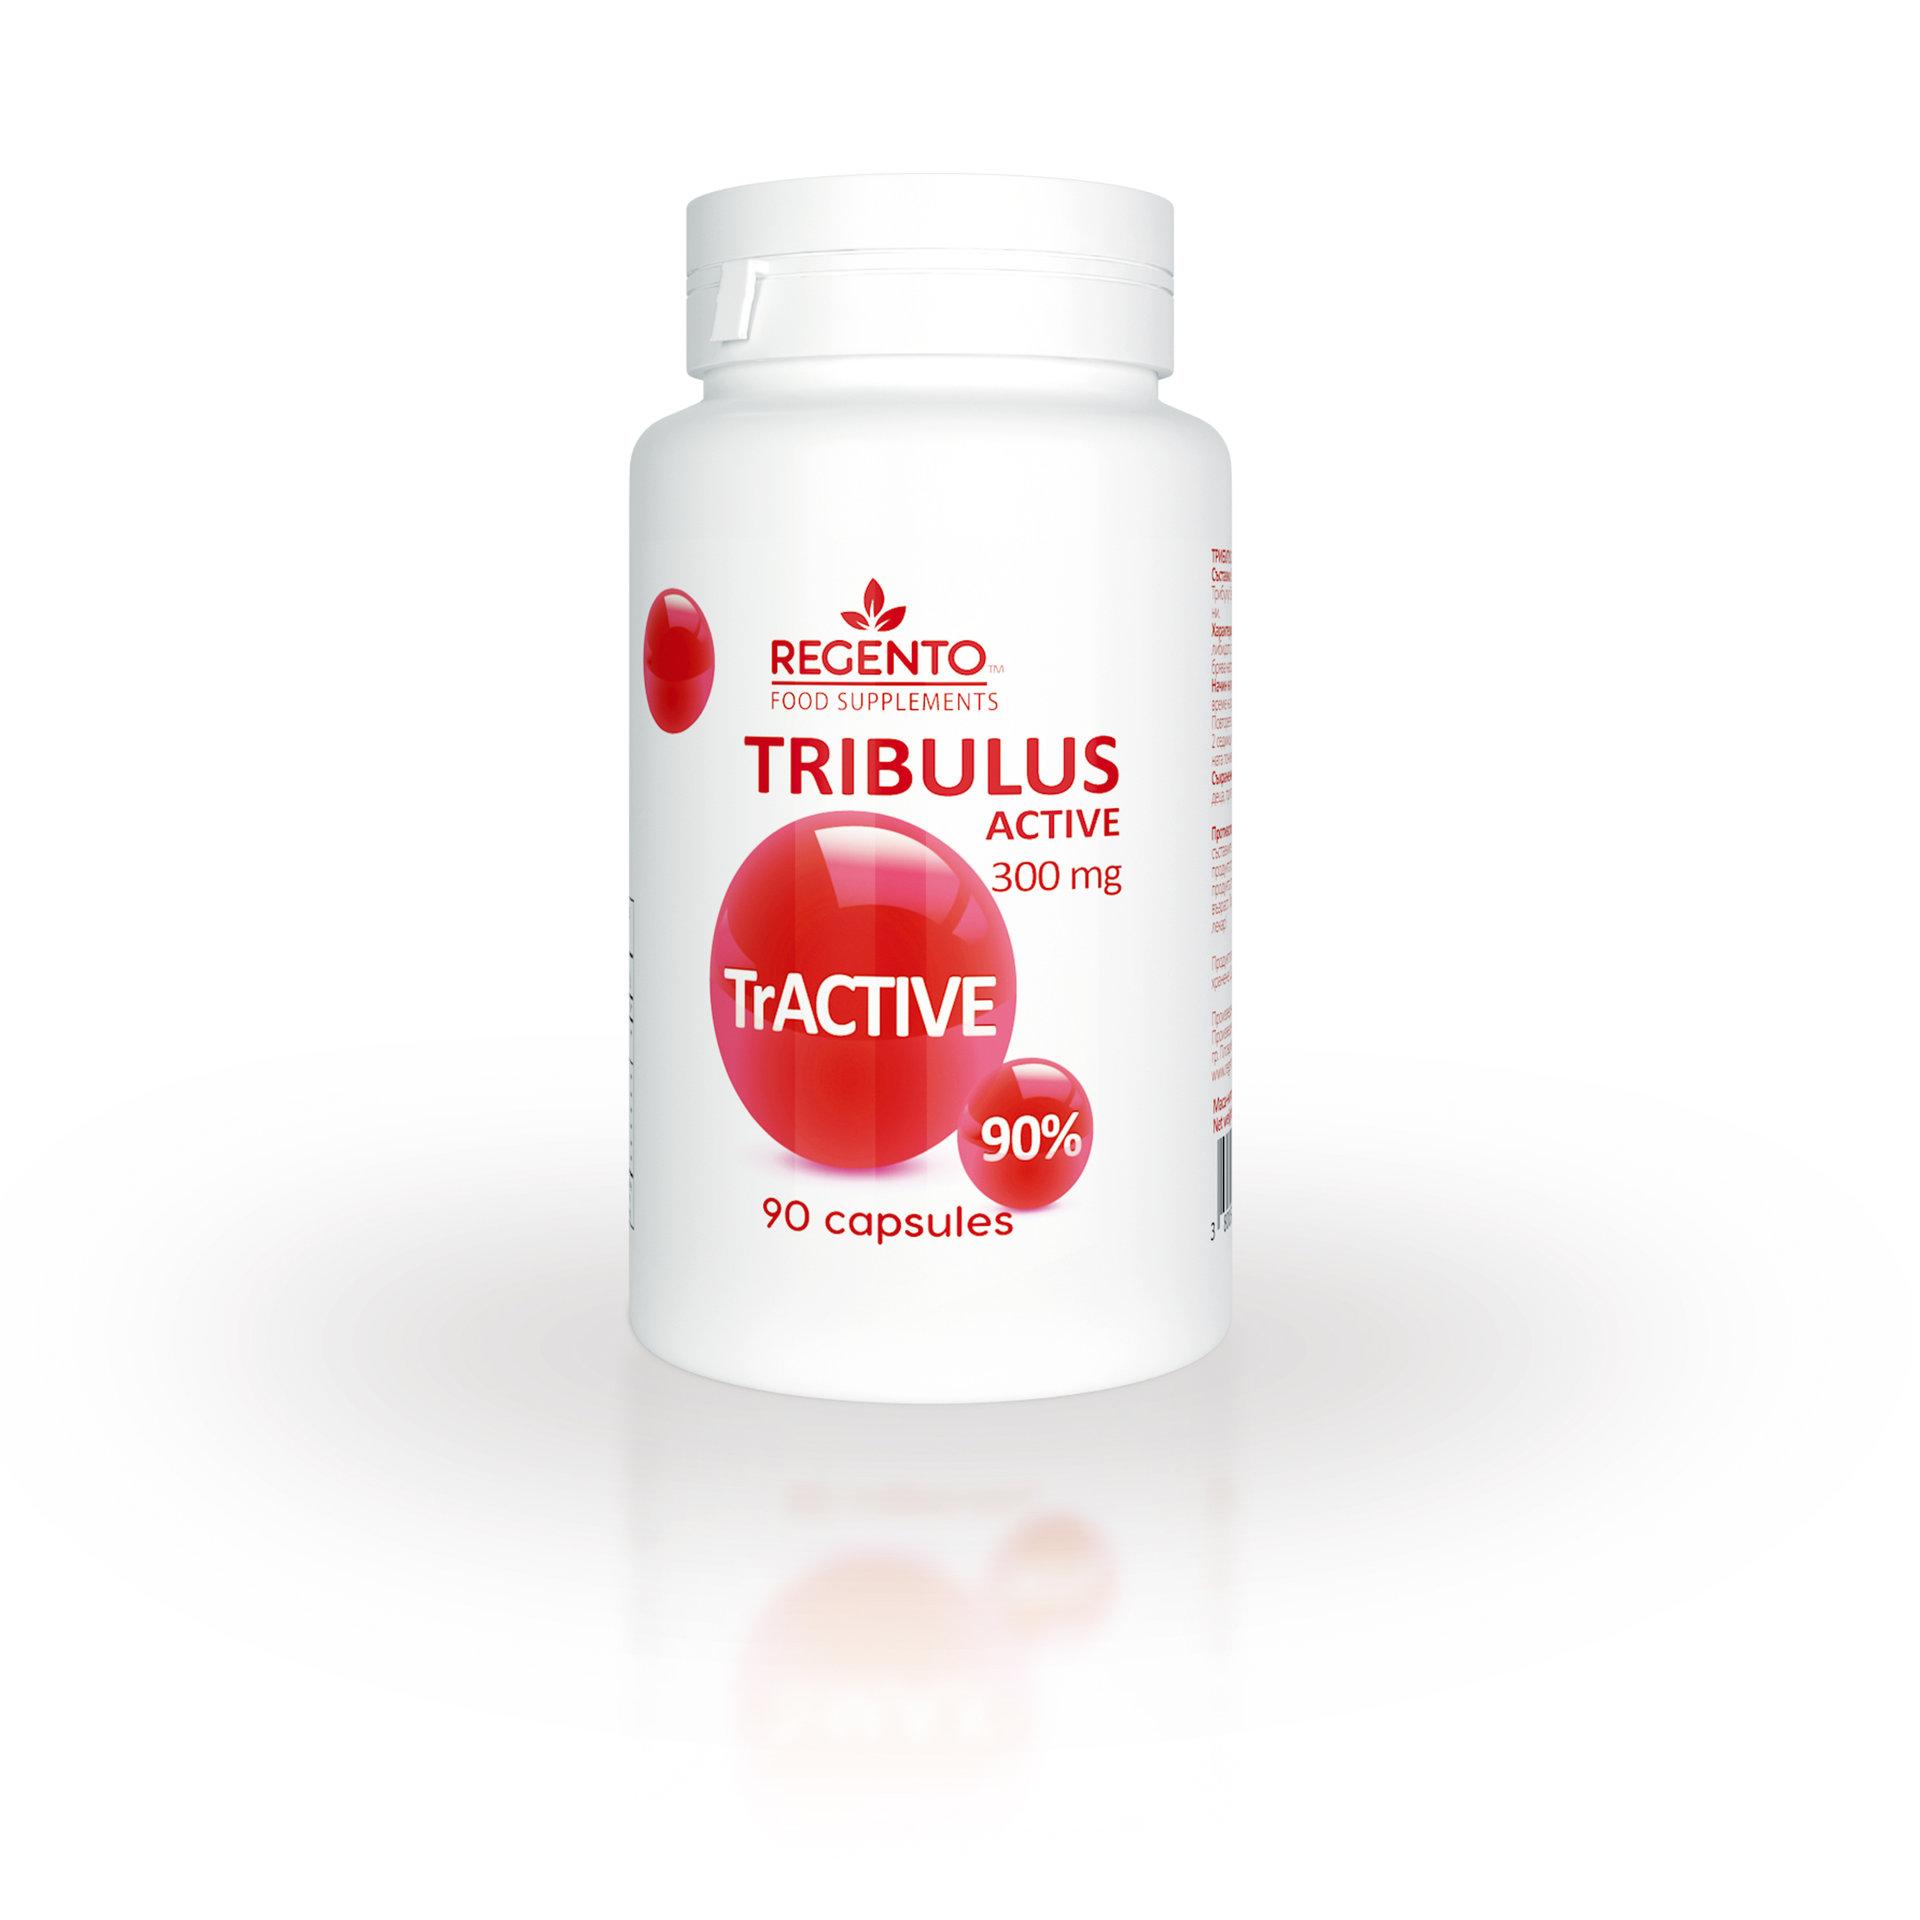 REGENTO TRIBULUS ACTIVE 300mg 90 capsules